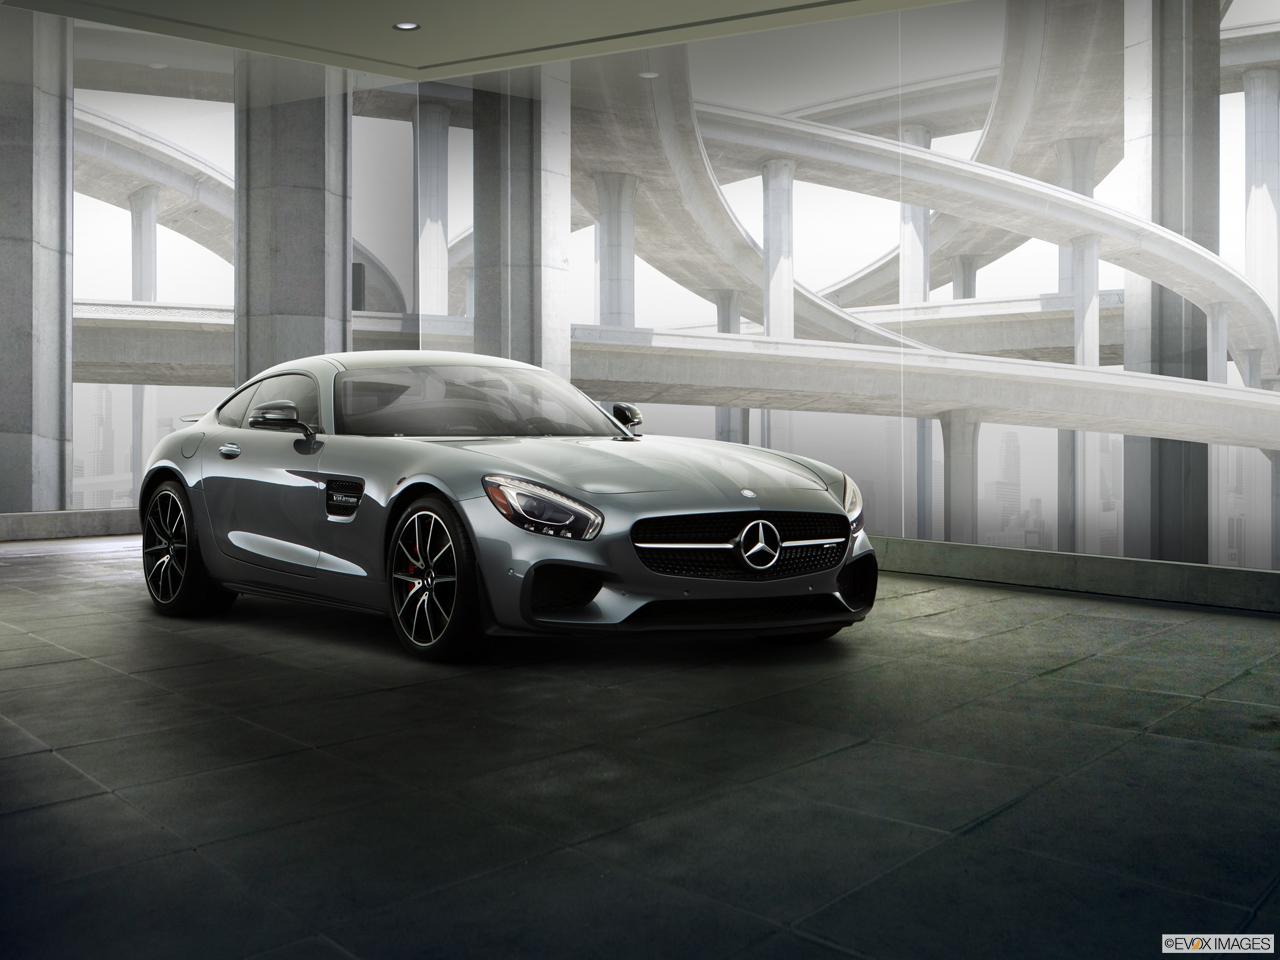 Mercedes benz parts catalog advance auto parts for Buy mercedes benz parts online